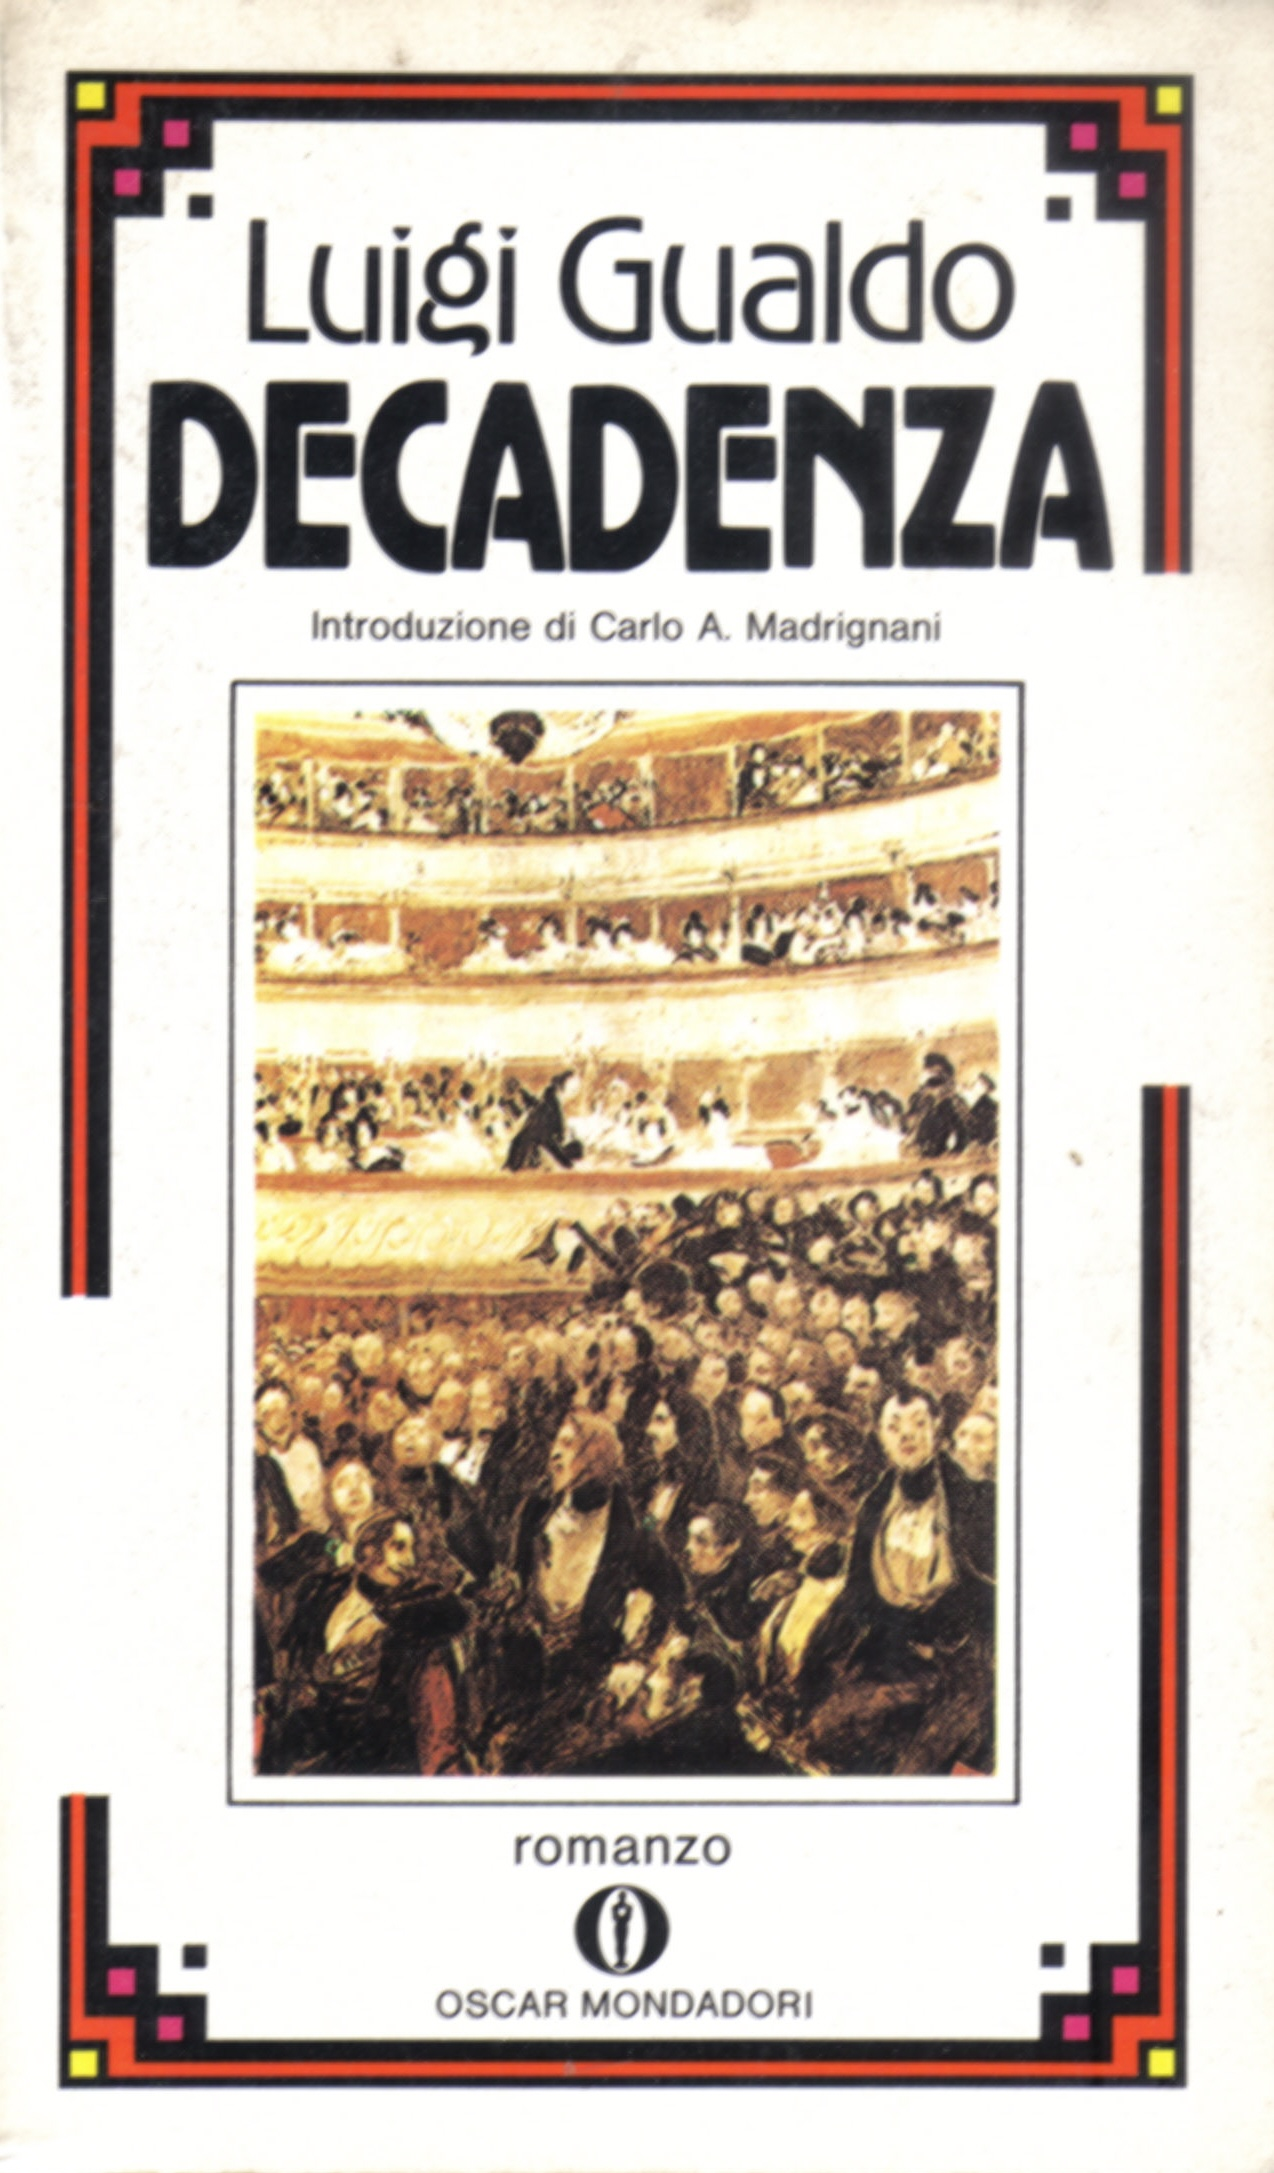 Decadenza